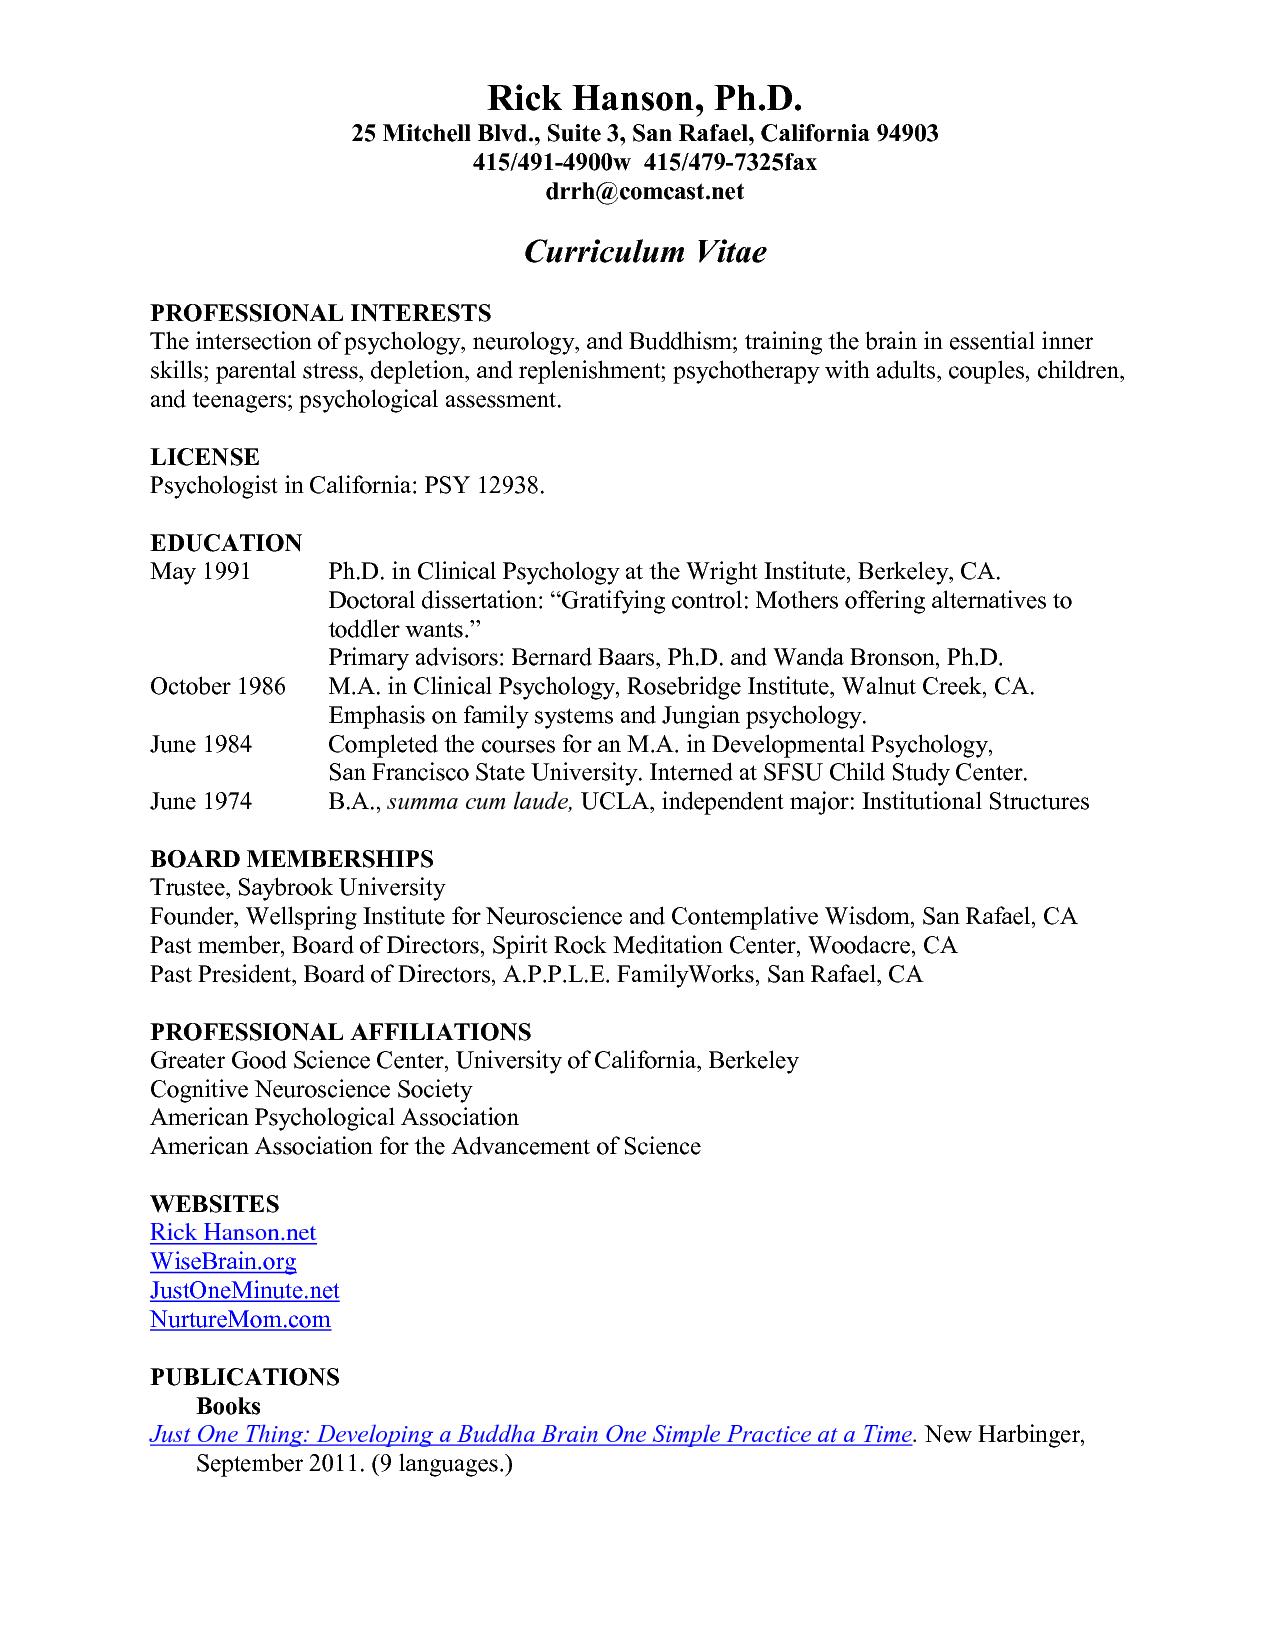 great resume templates reddit